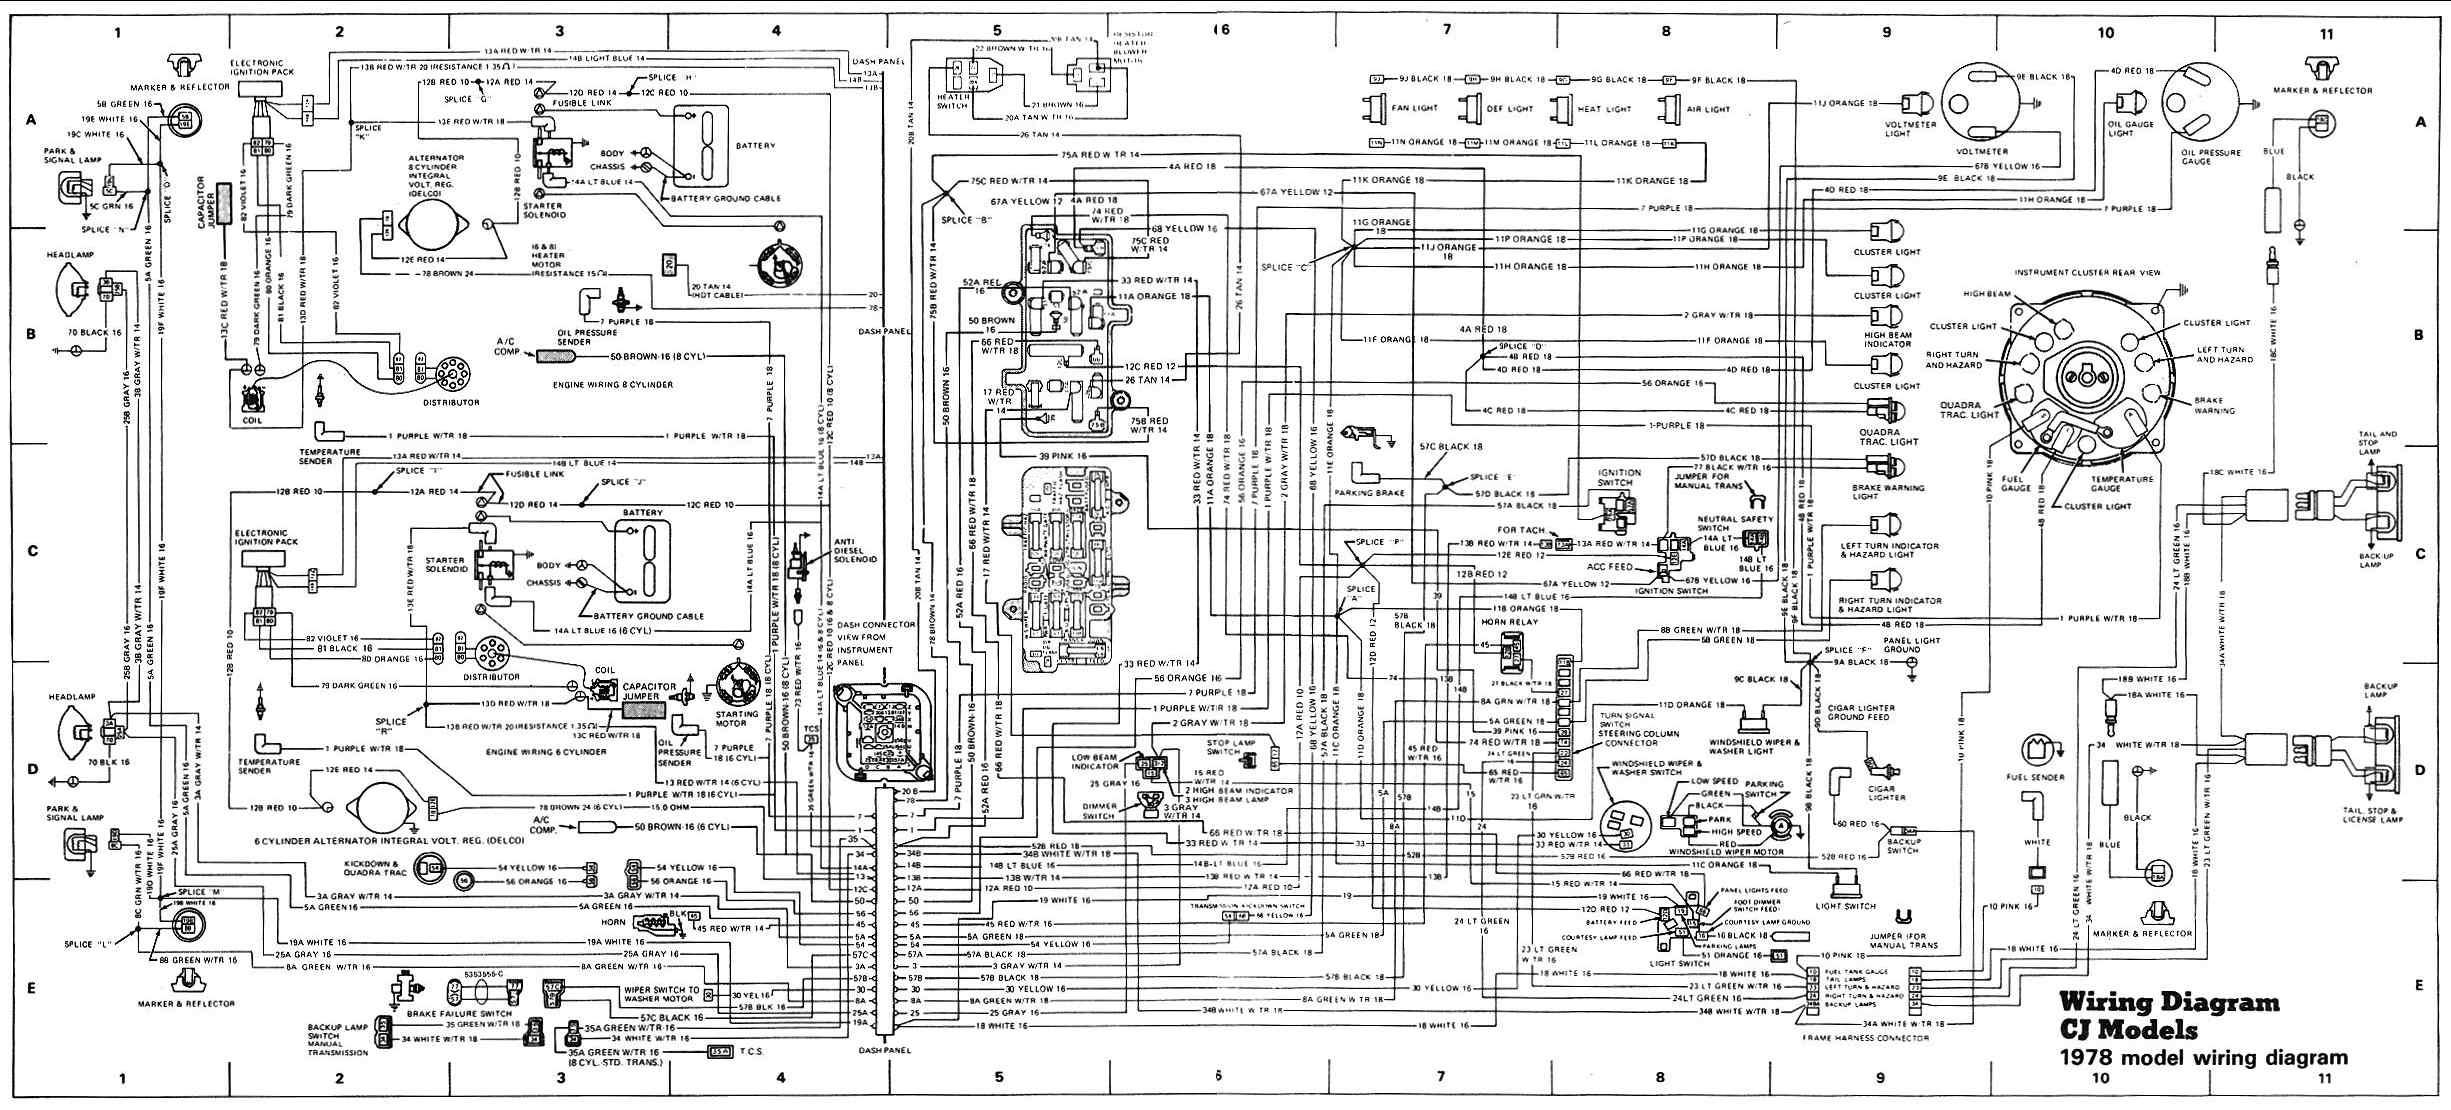 medium resolution of 1997 jeep tj fuel pump wiring diagram wiring library rh 33 bloxhuette de 1997 jeep wrangler wiring diagram pcm 1997 jeep wrangler fuse diagram